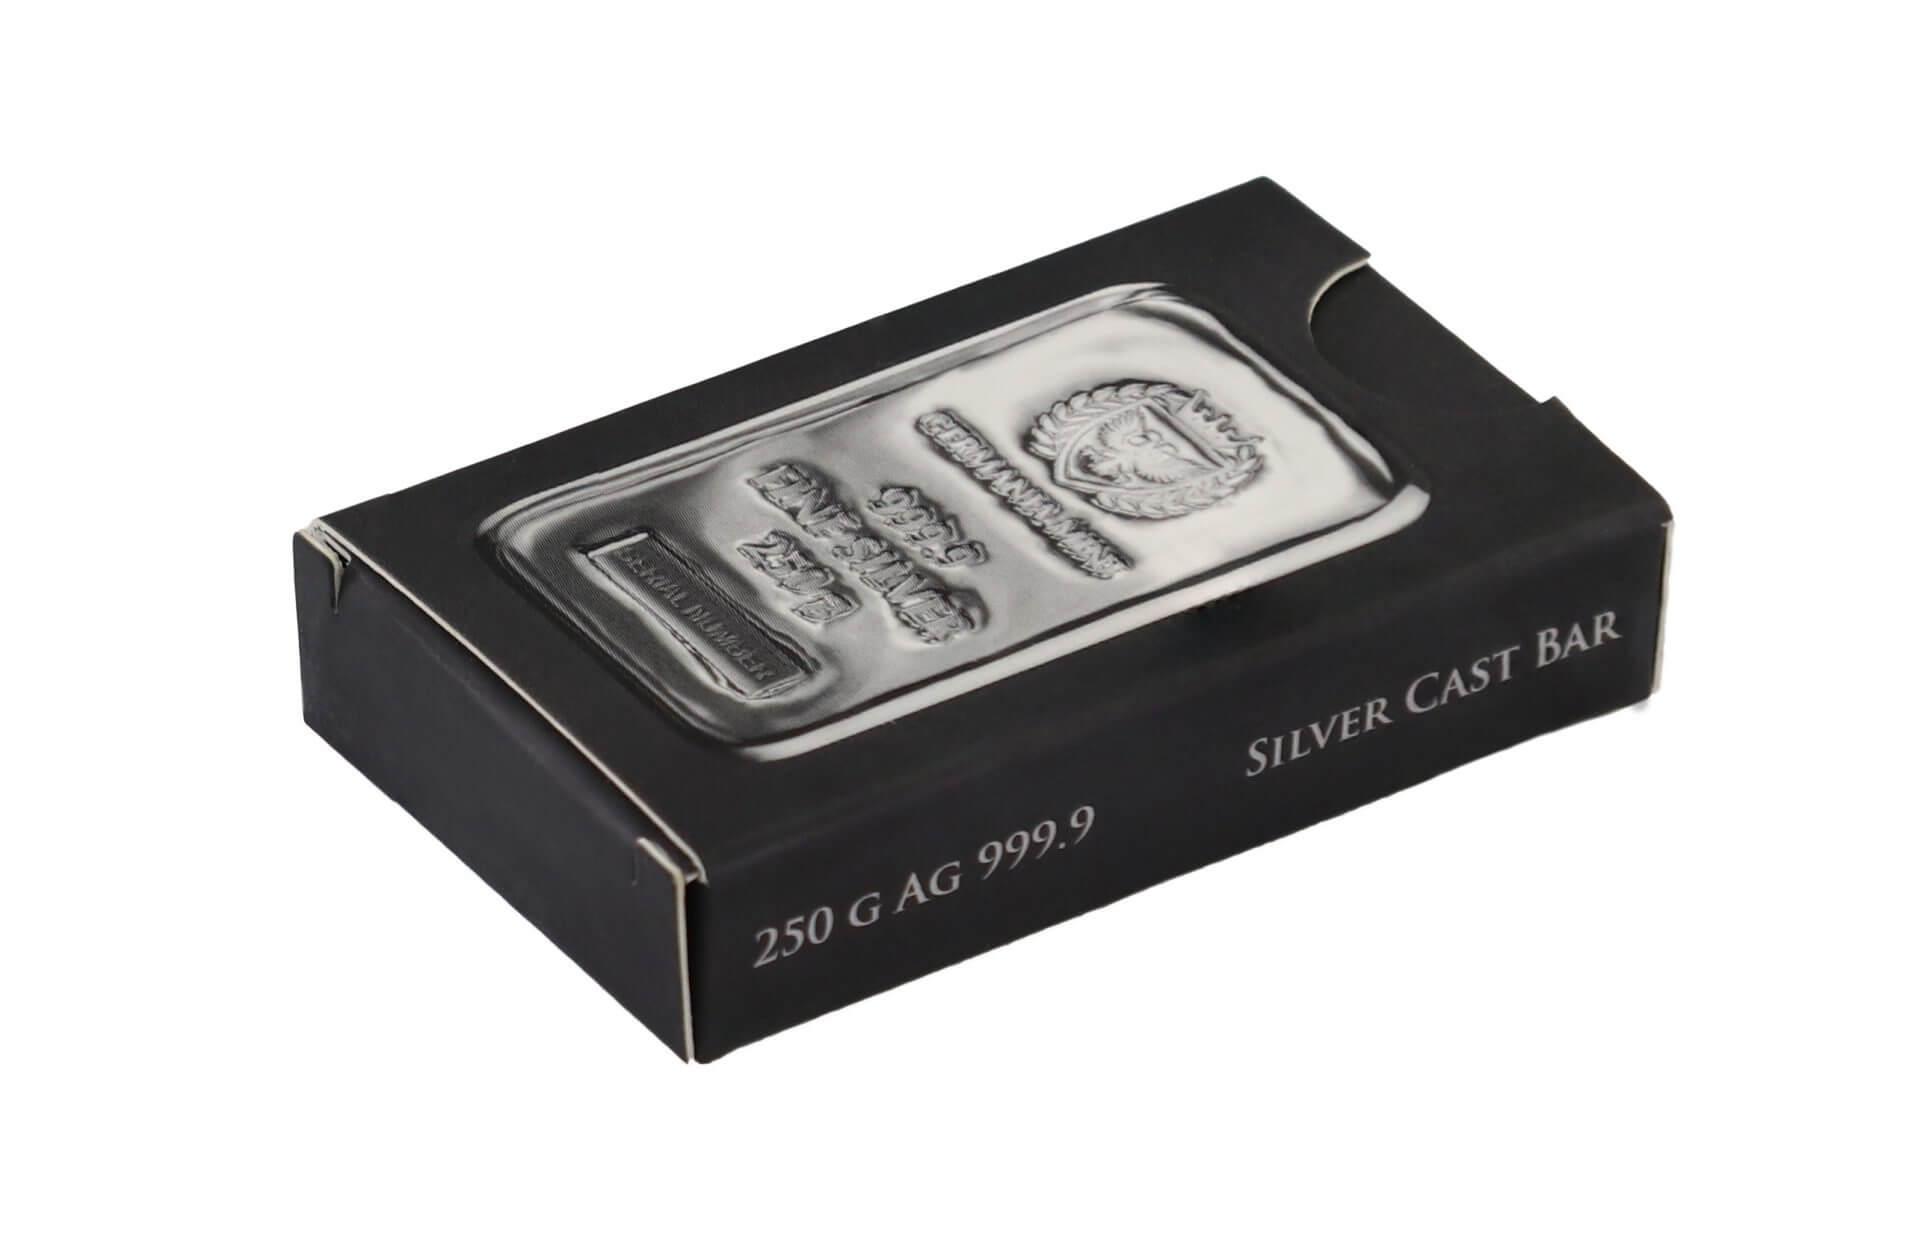 Germania Mint 250g .9999 Silver Cast Bullion Bar 3